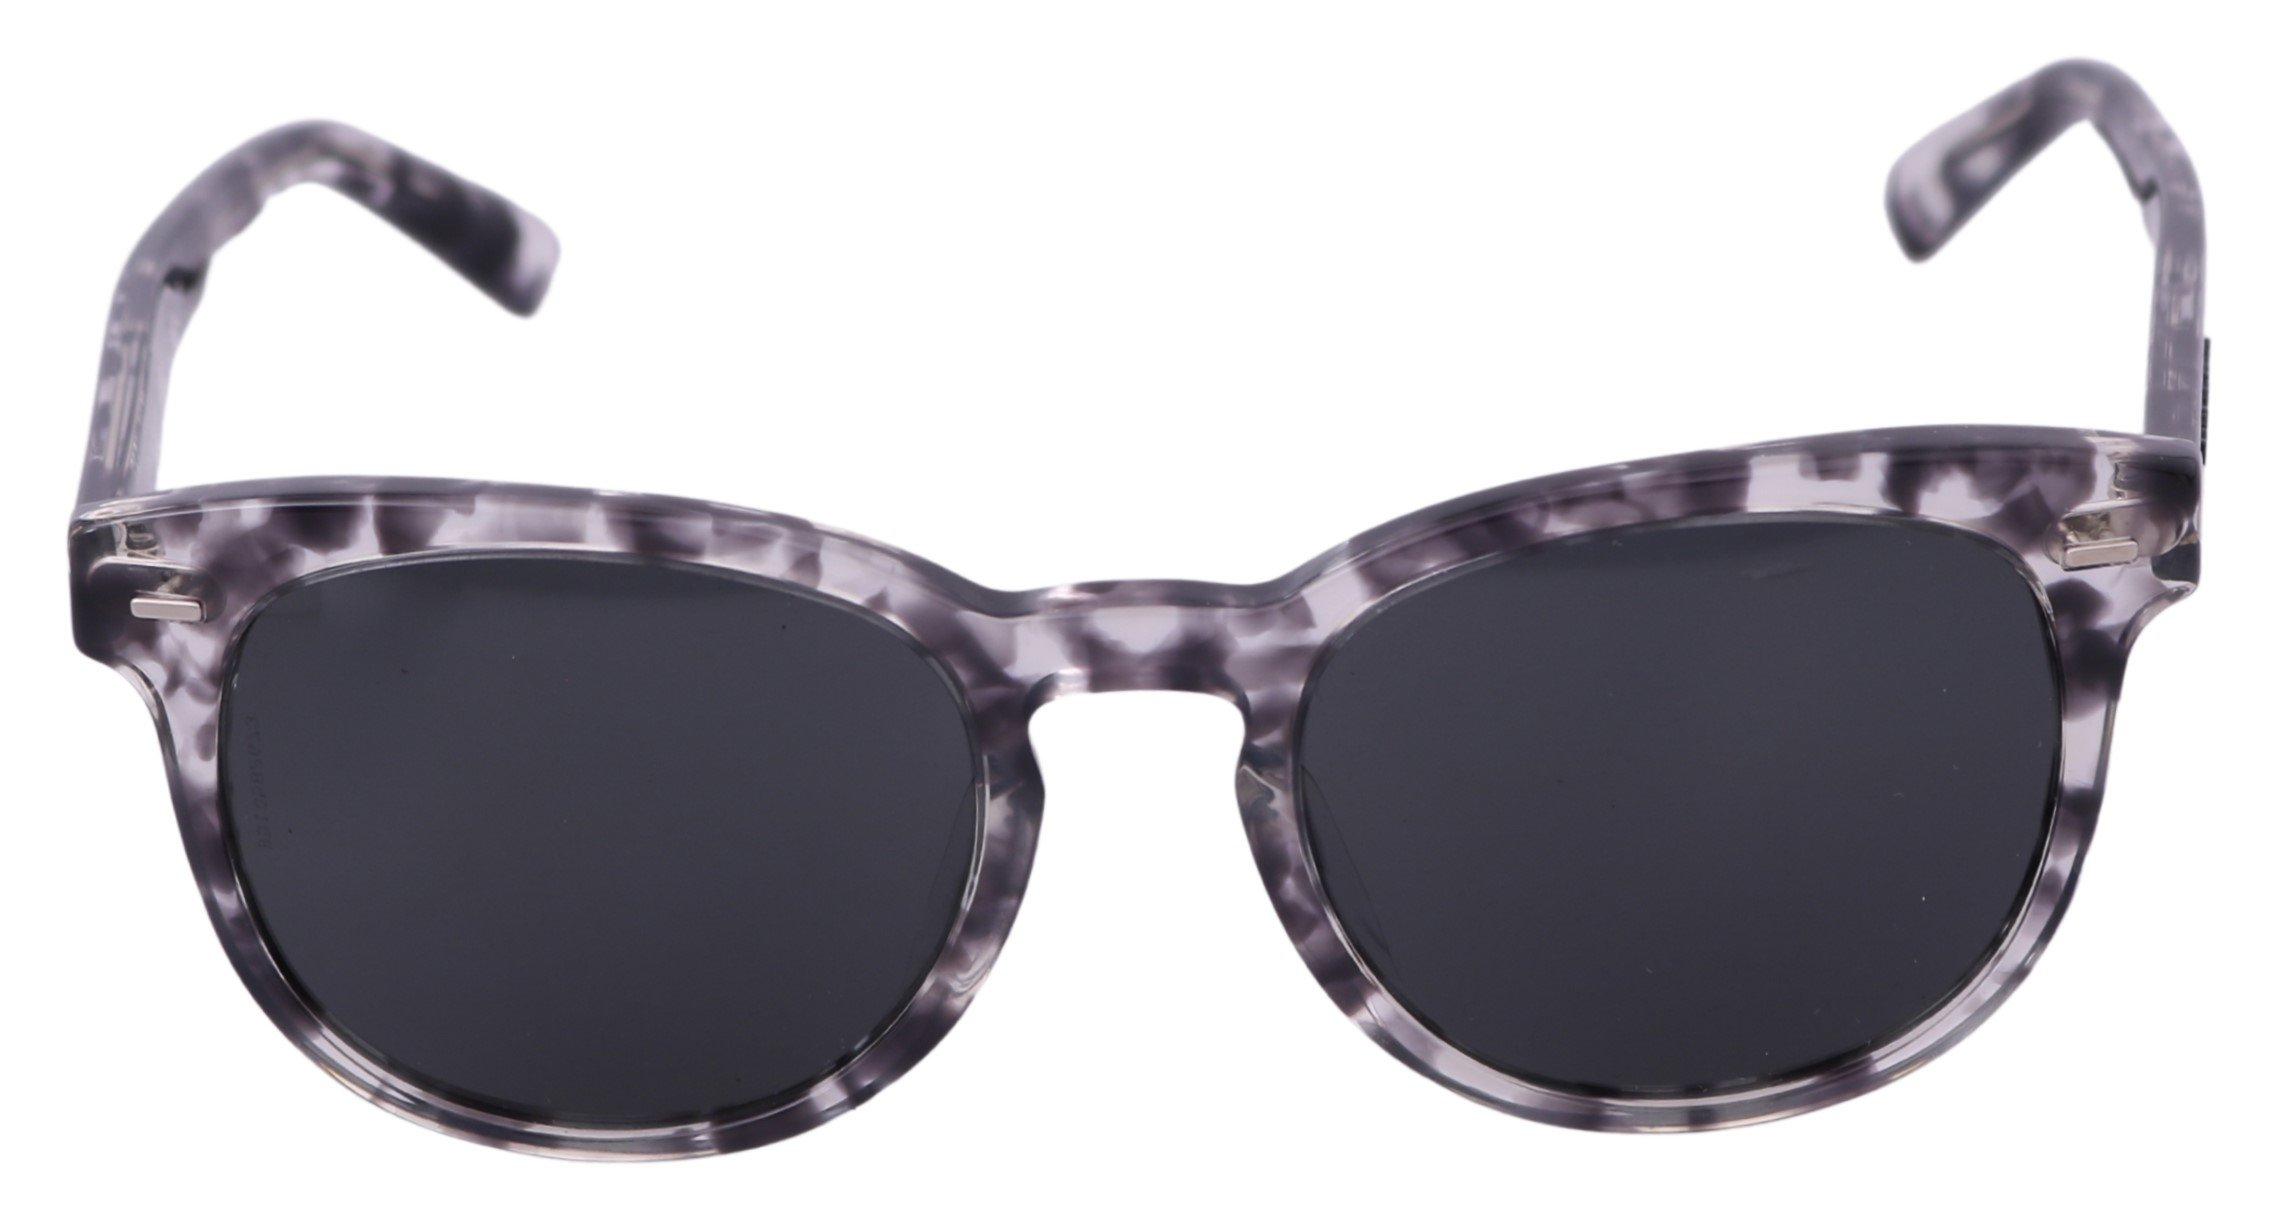 Dolce & Gabbana Men's Aviator Pilot Sunglasses Gray GLA740